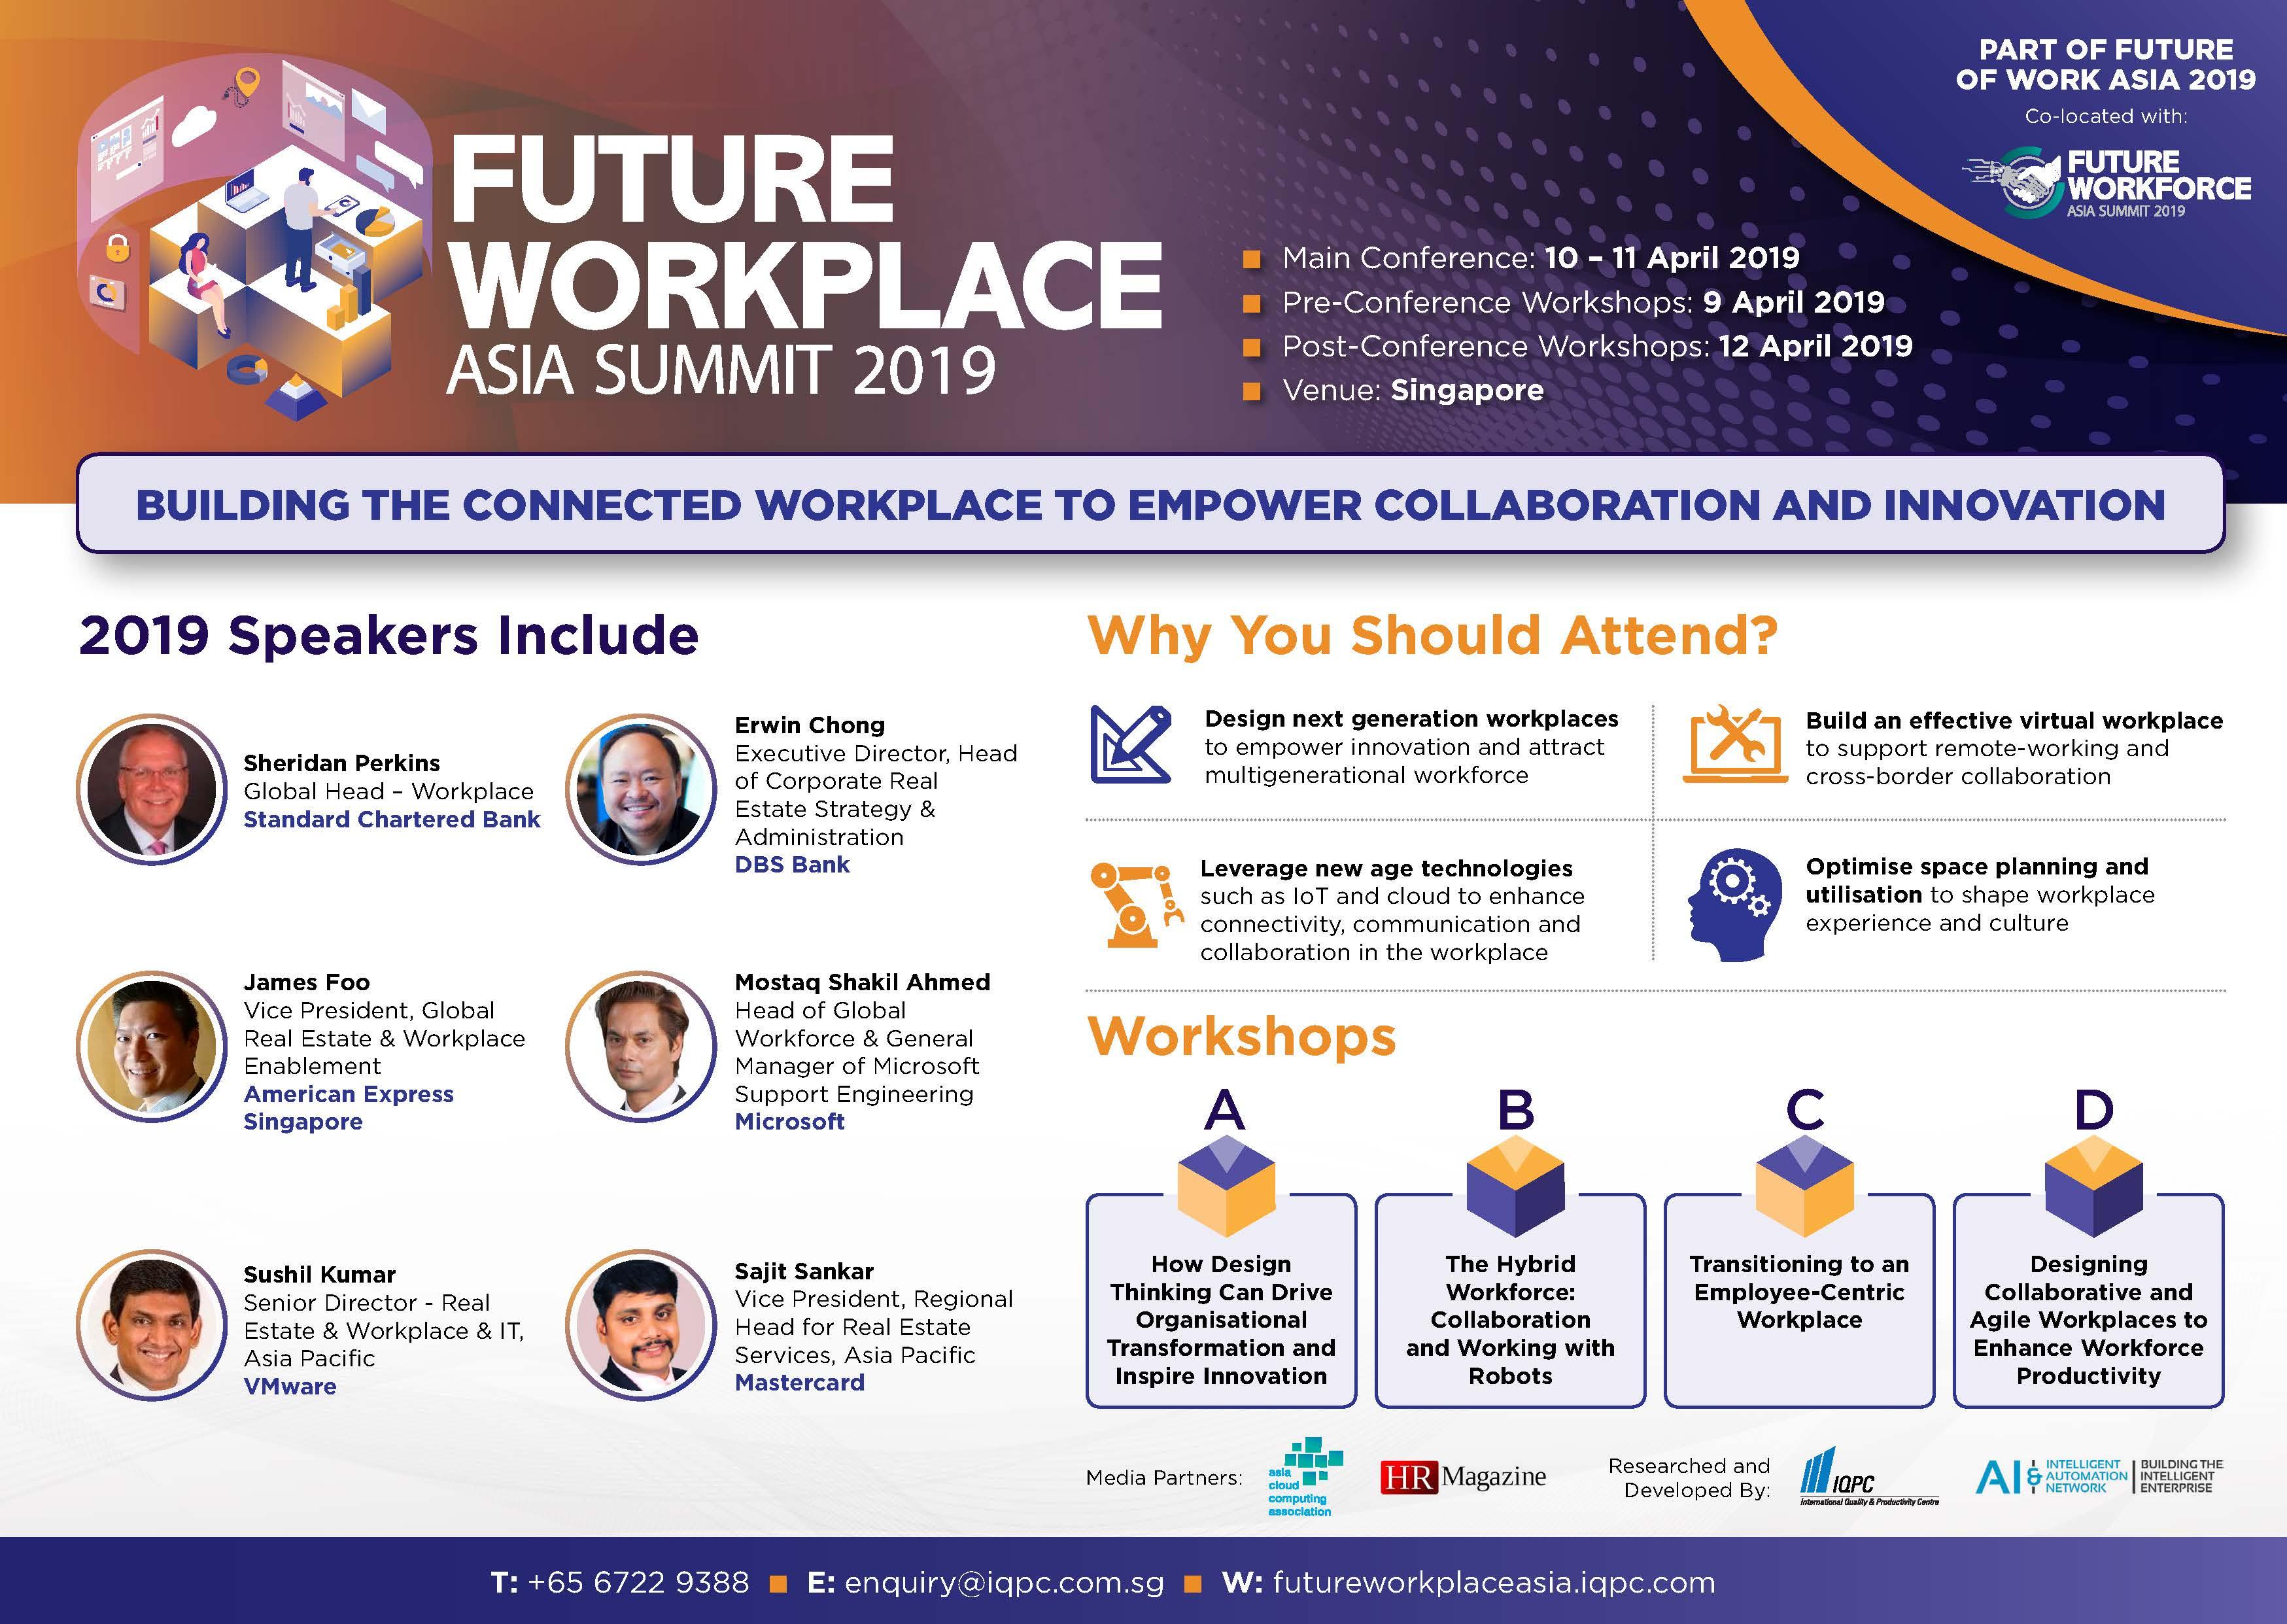 Future Workplace Asia Summit 2019 Brochure spex